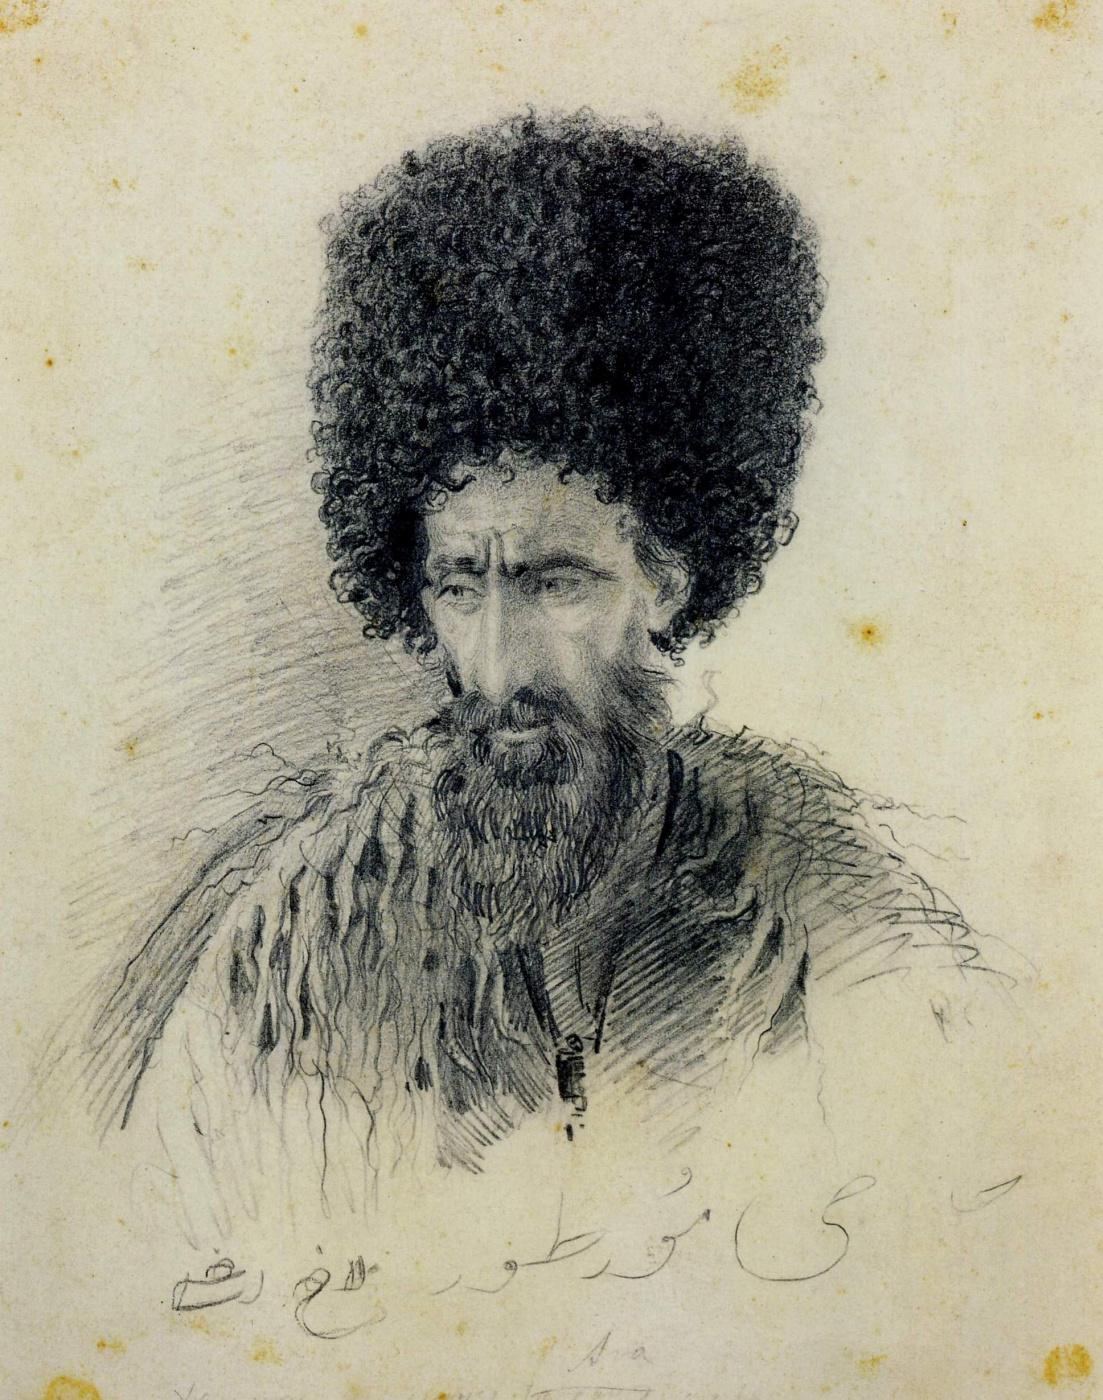 Vasily Vereshchagin. Lezgins Haji Murtuz from Dagestan